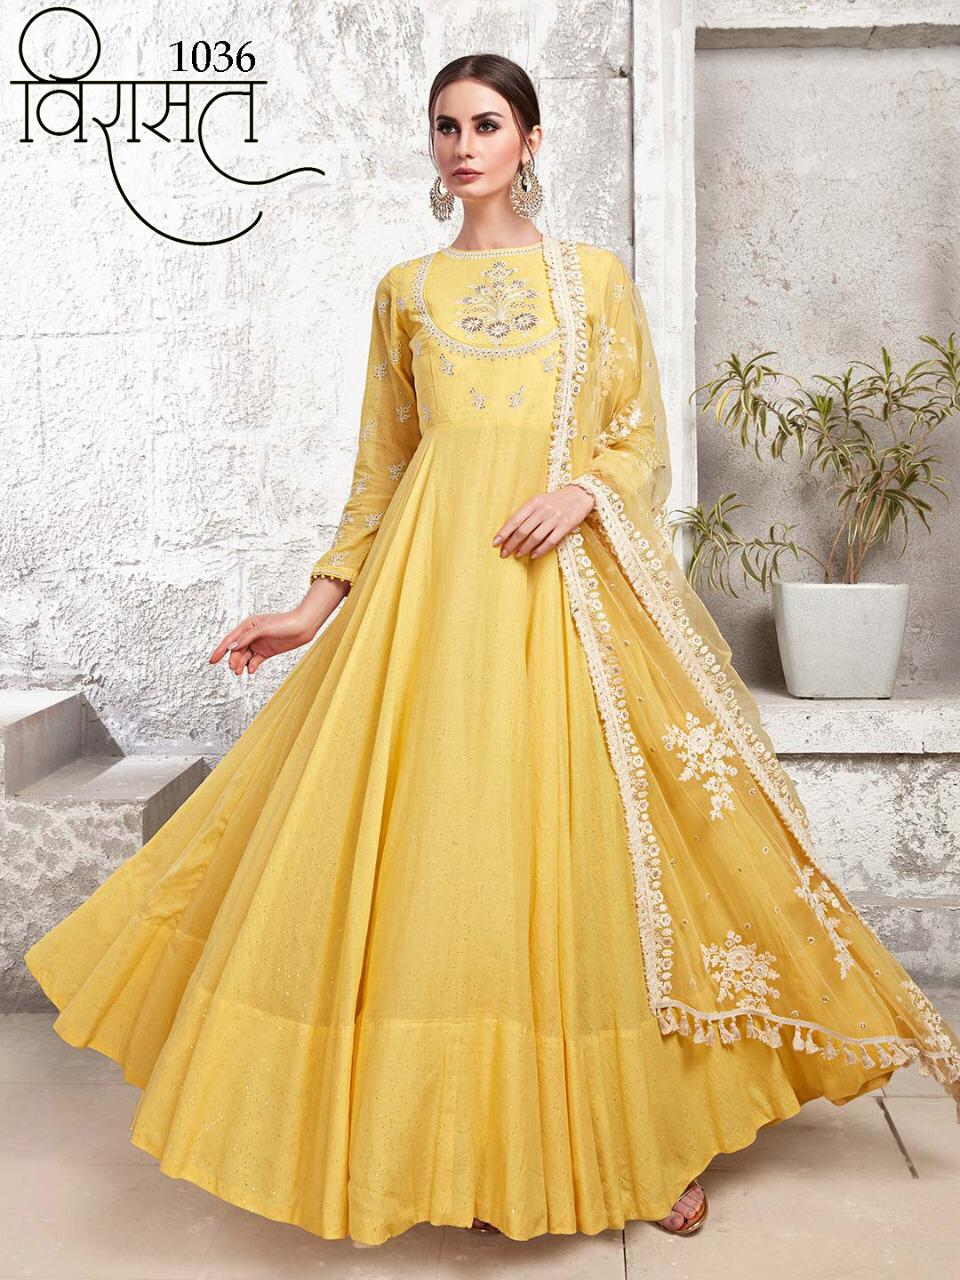 Virasat Vol 8 Anarkali Indo Western Wedding Gown Diwan Fashion